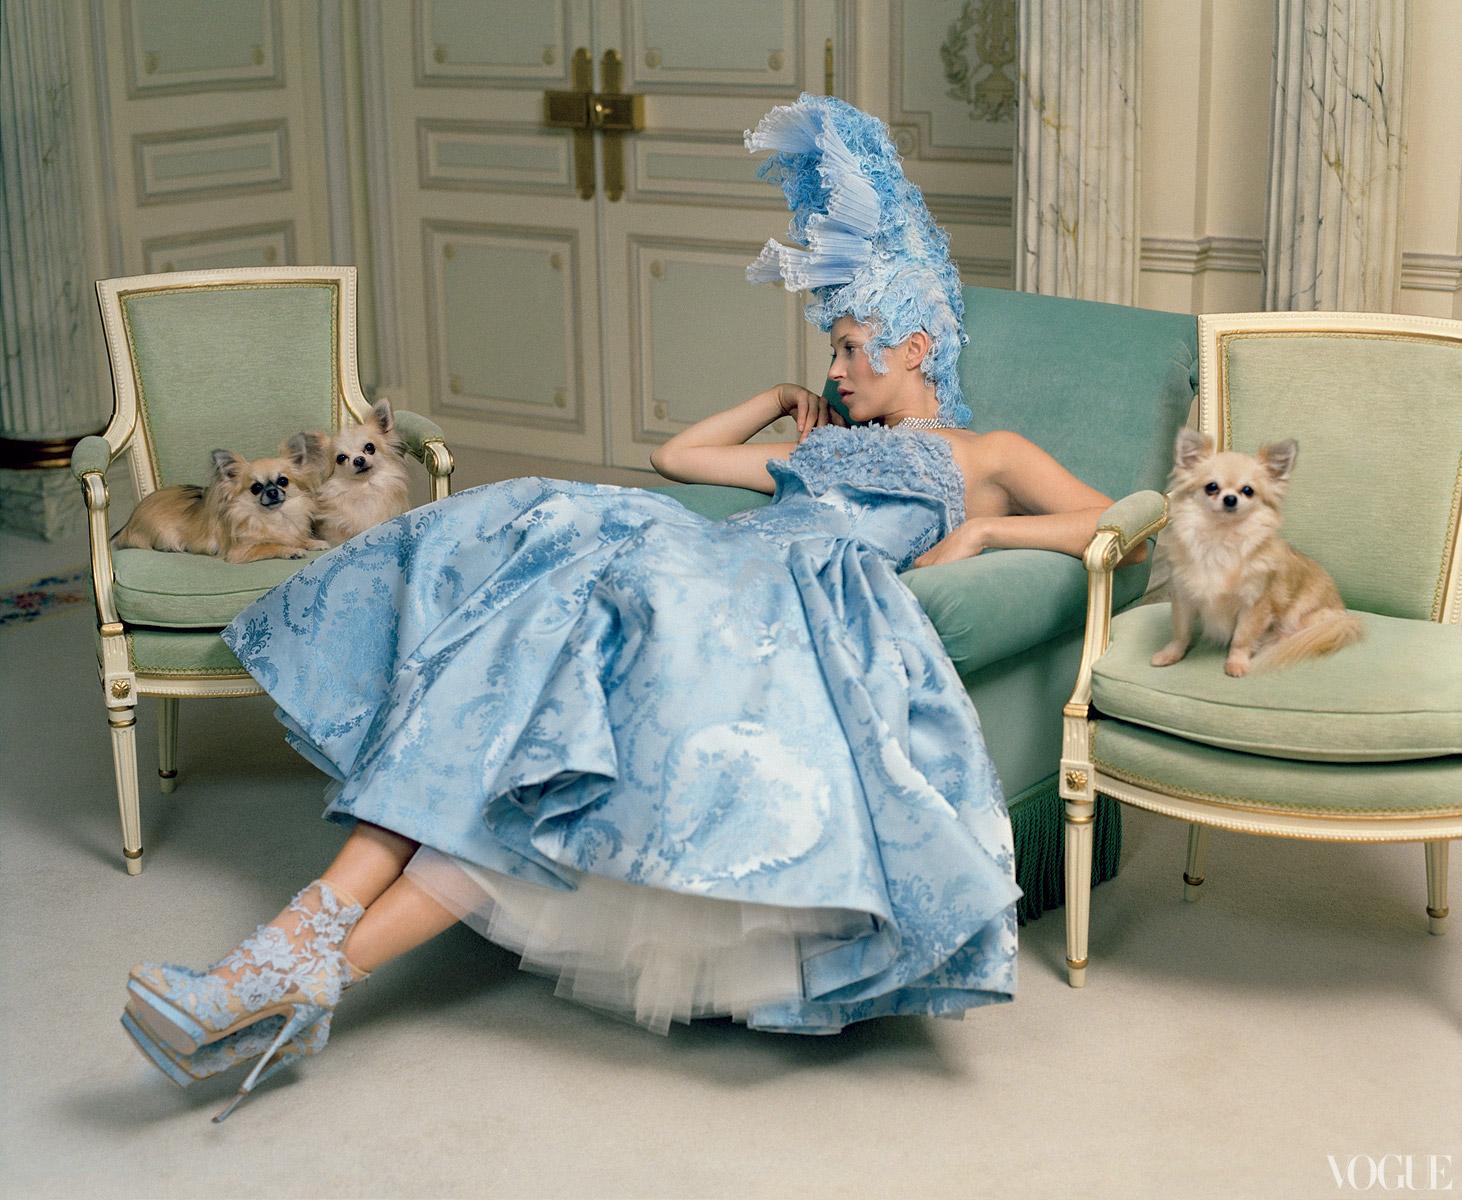 A cornflower-blue dress by Sarah Burton for Alexander McQueen. Lace shoe perfection!